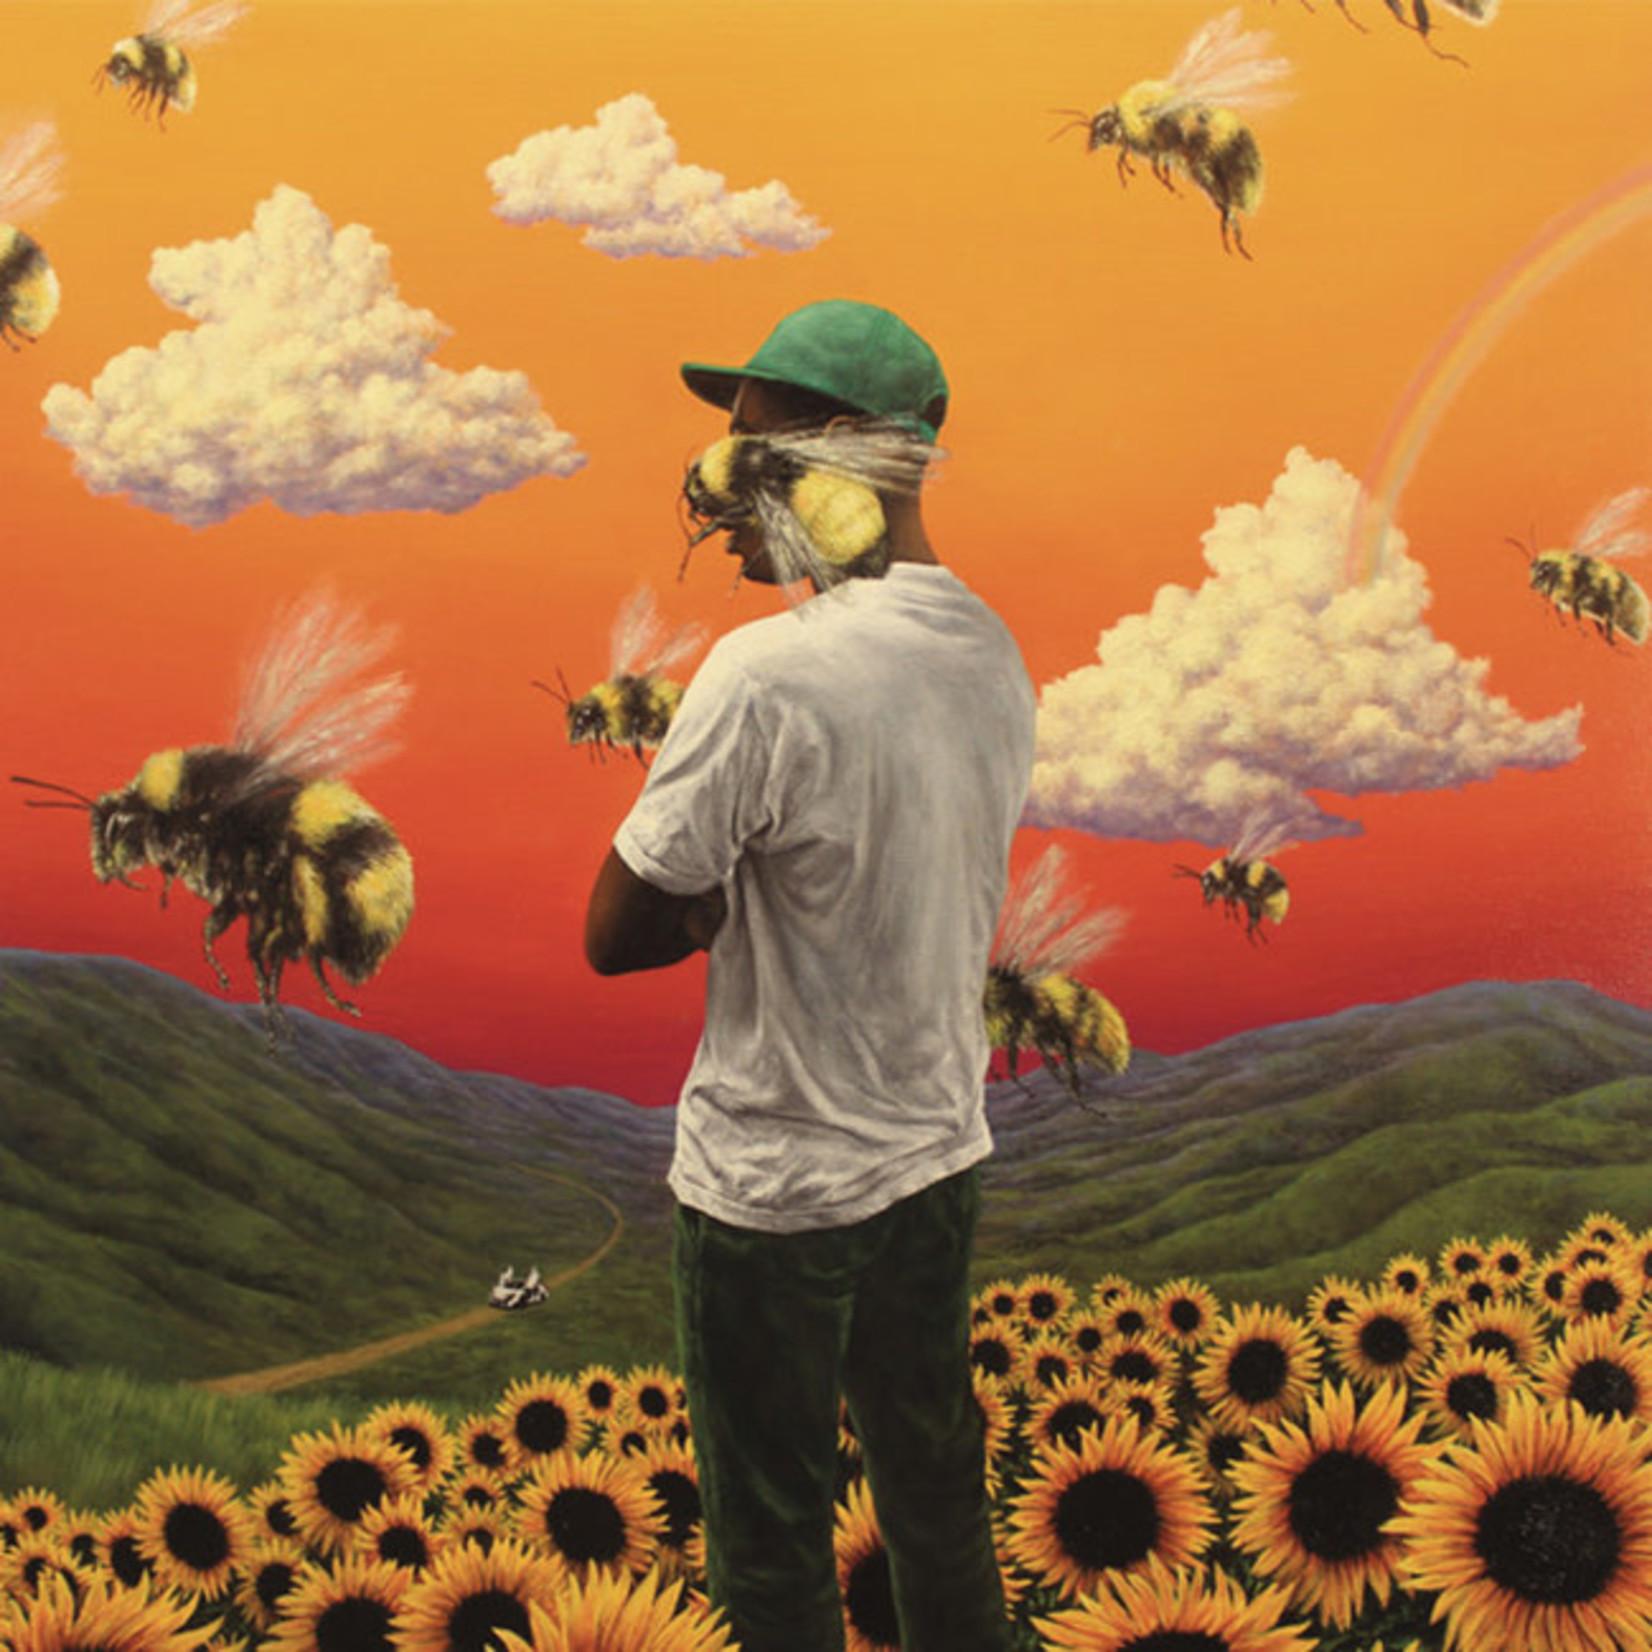 [New] Tyler, The Creator: Flower Boy